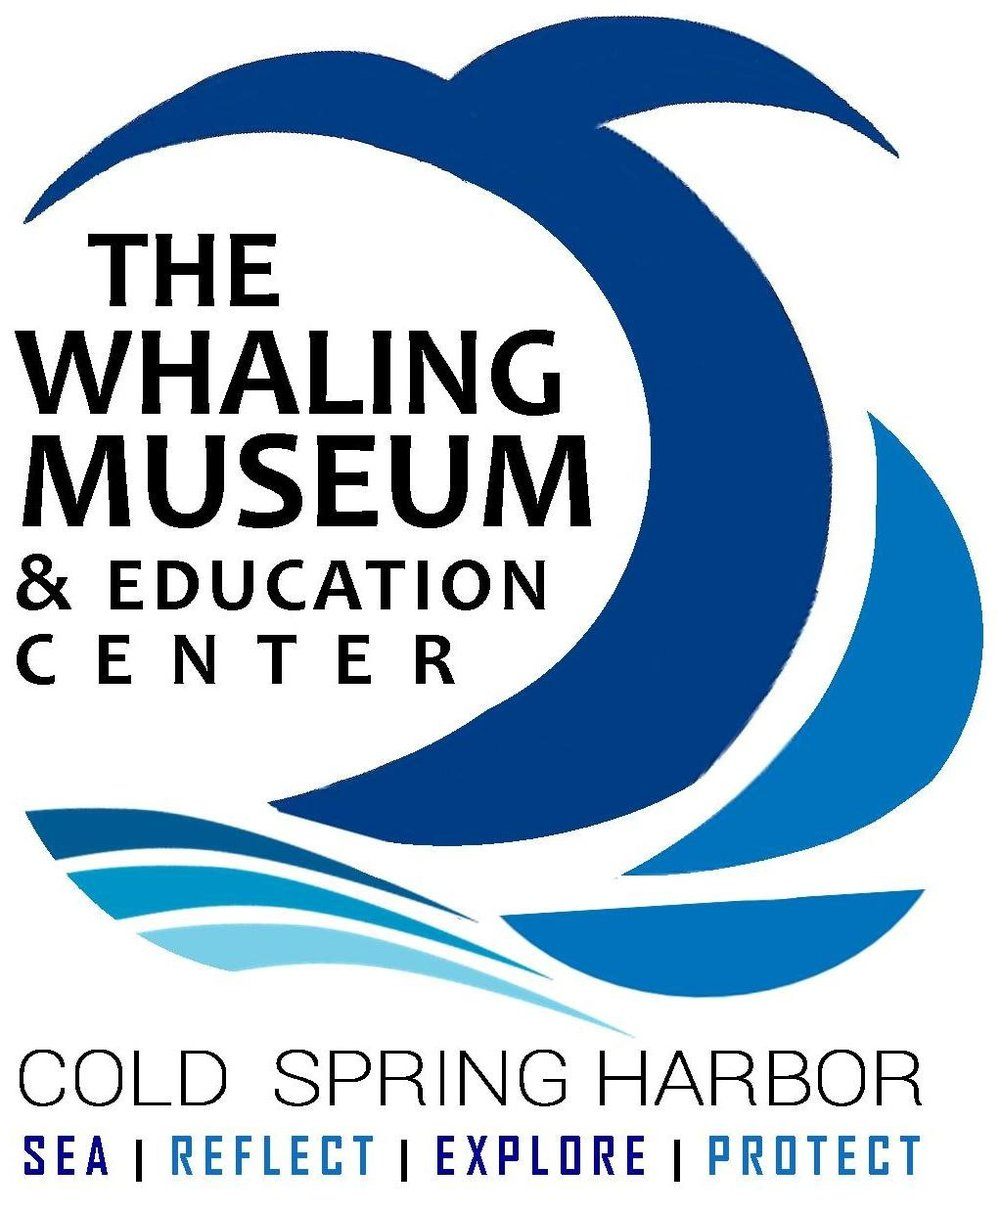 Whaling museum logo.jpg